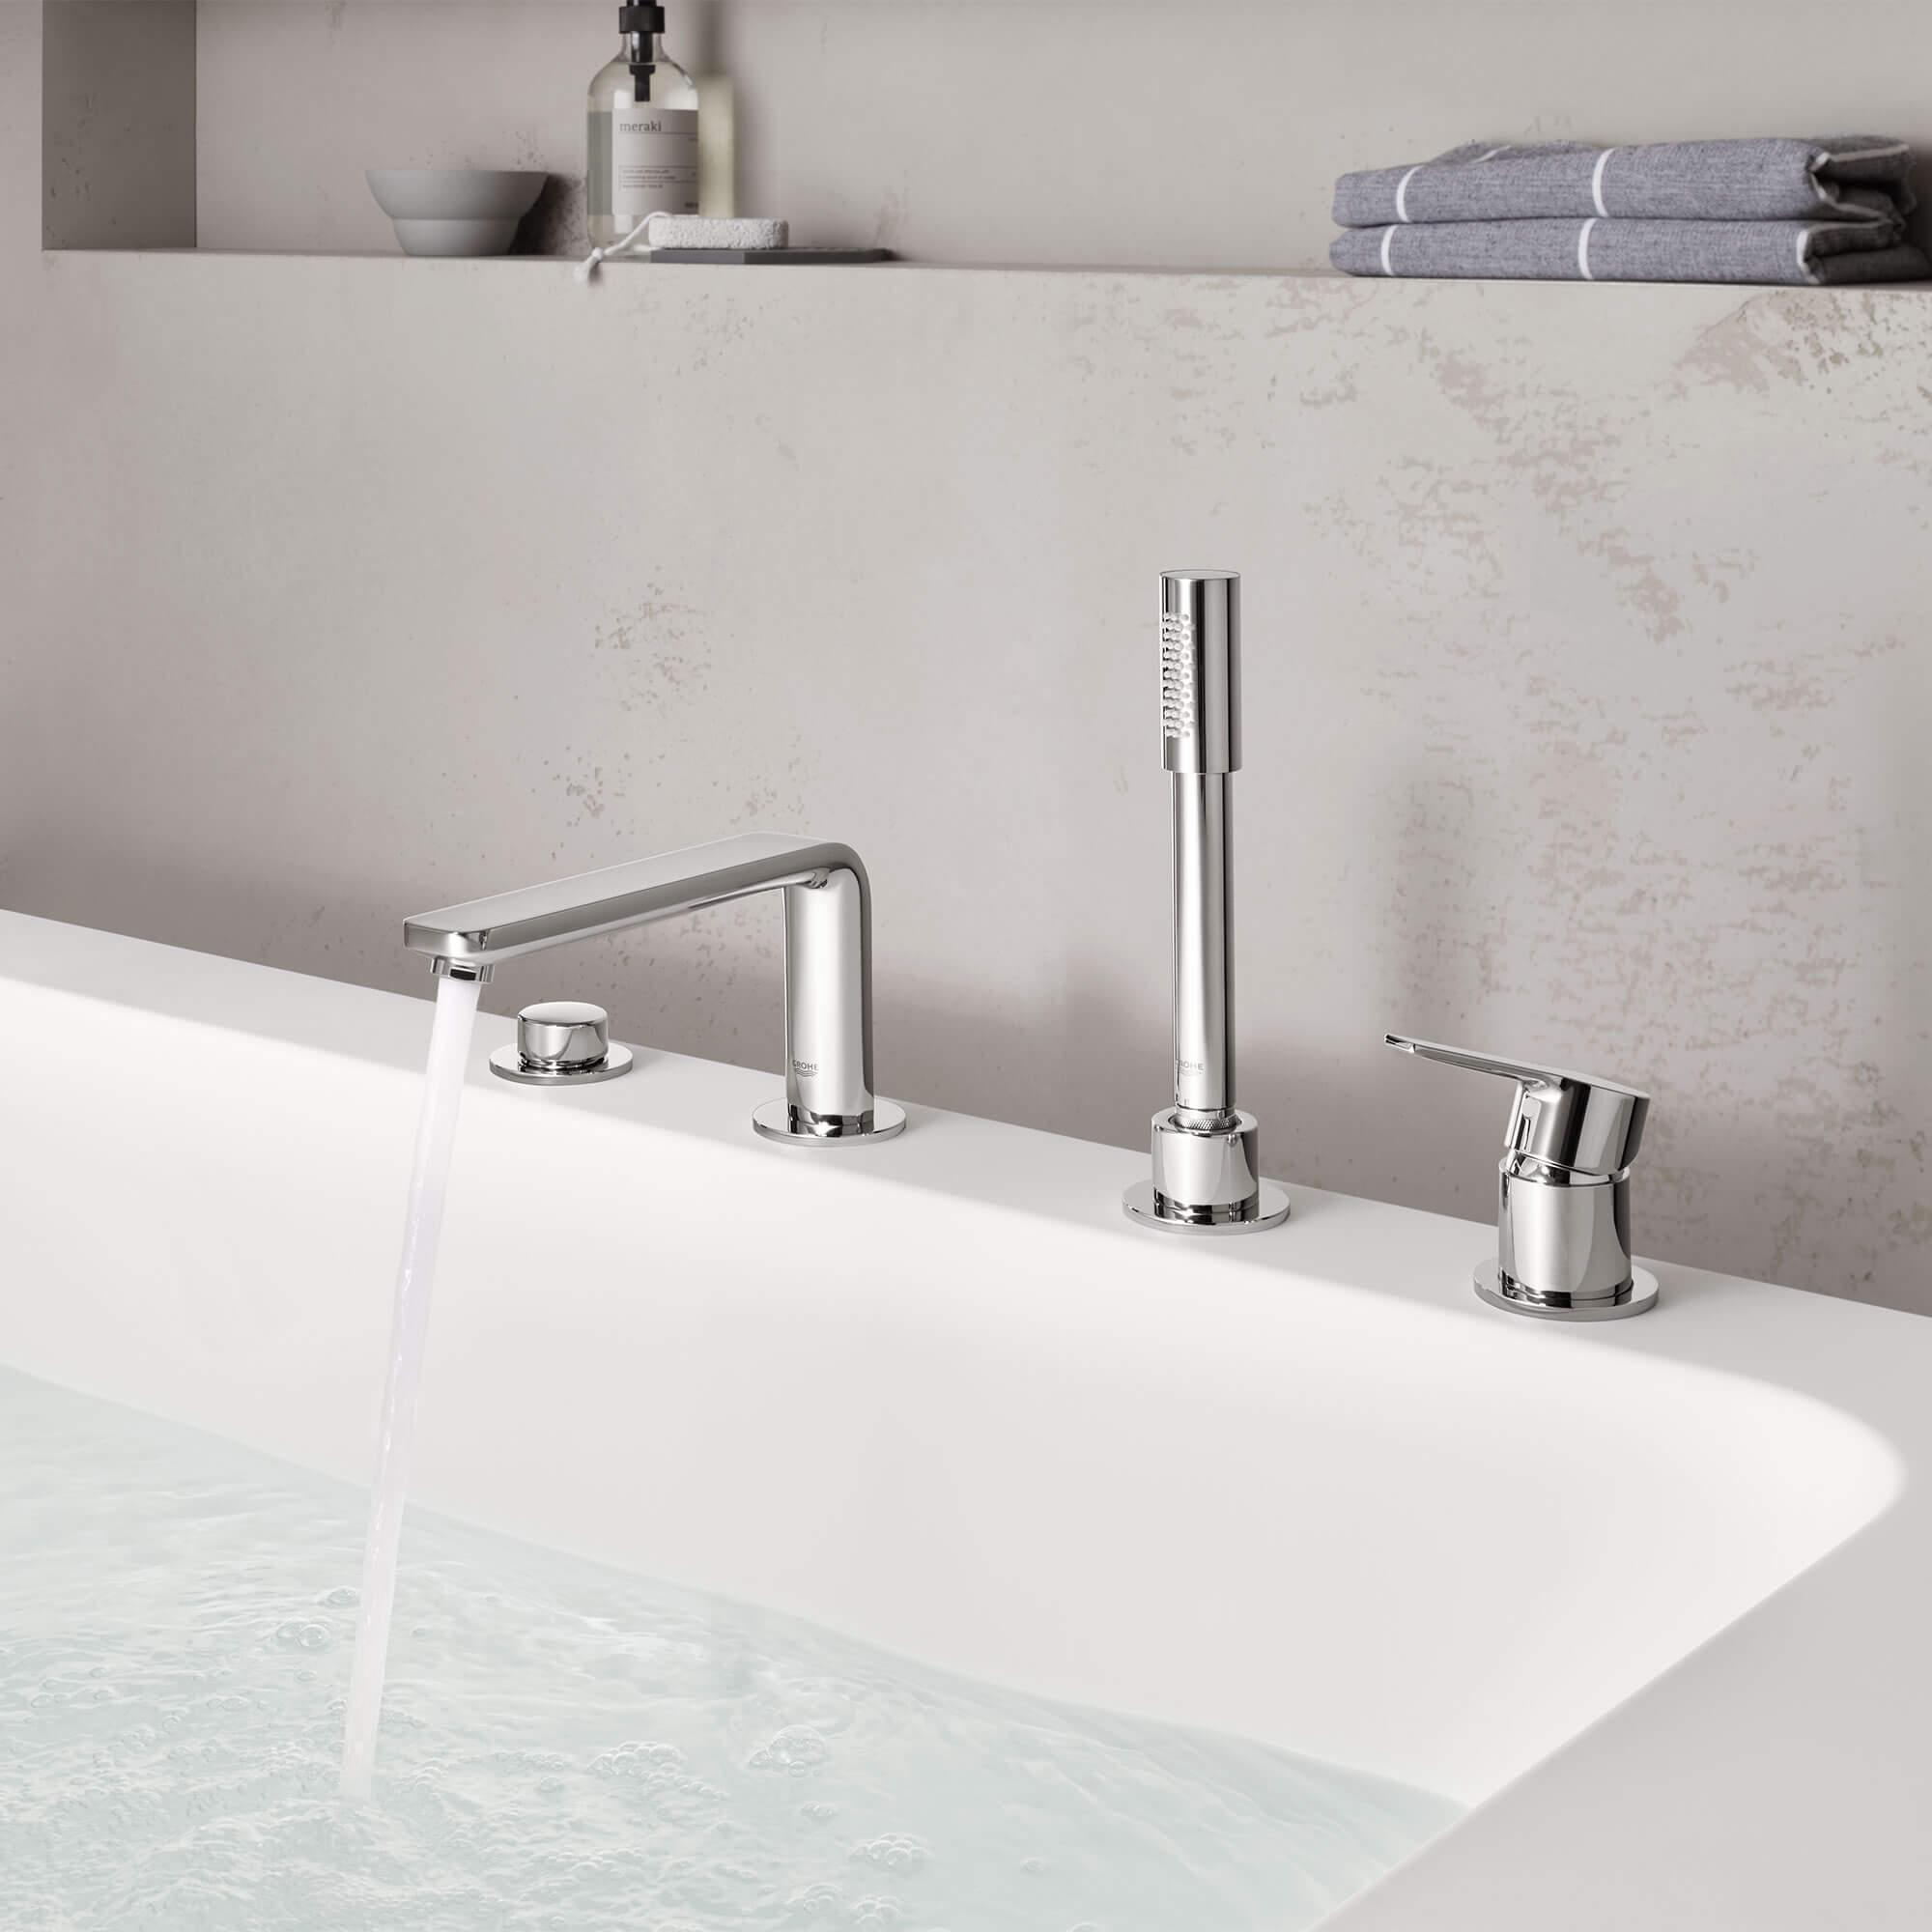 GROHE Lineare Bathtub Faucet